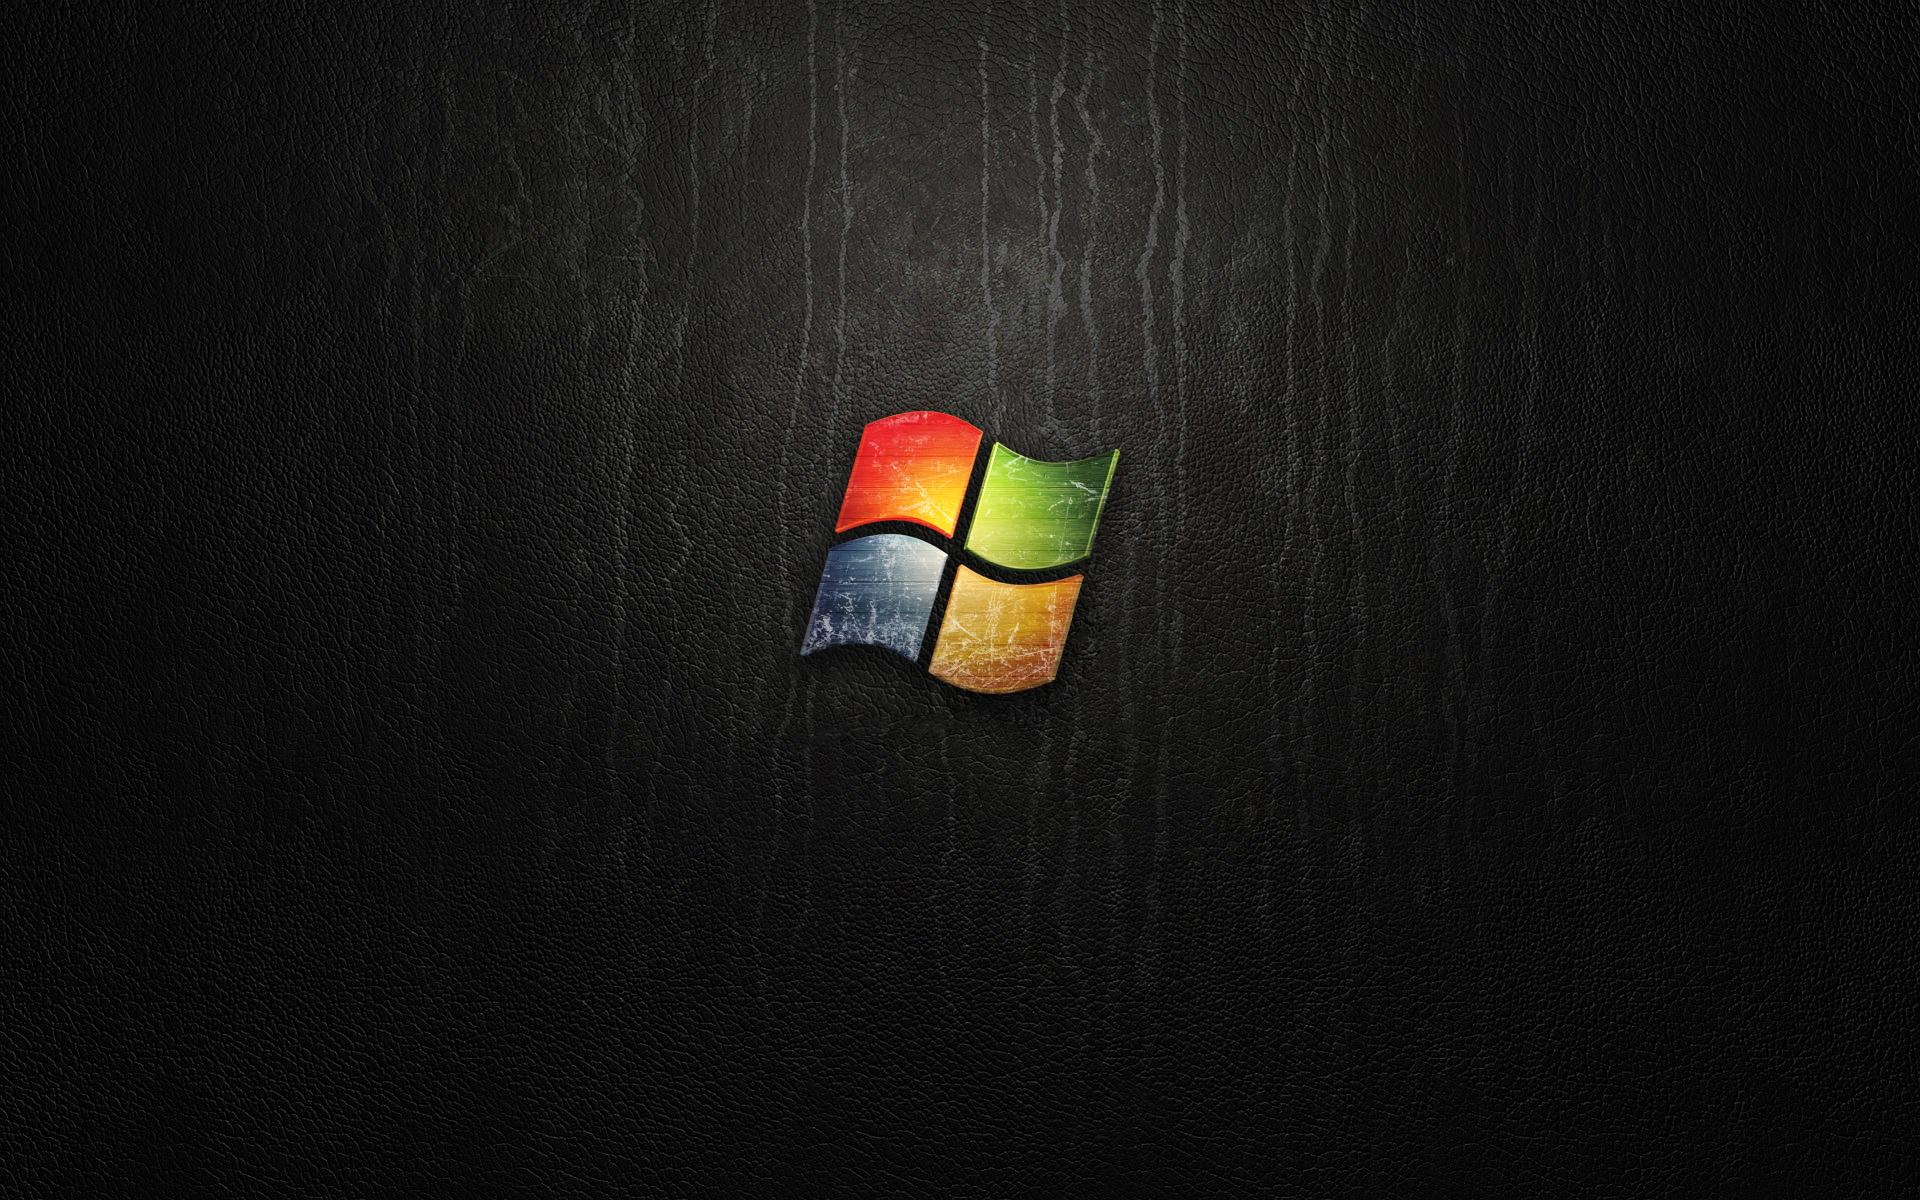 Windows Wallpaper Windows Wallpaper 1920x1200